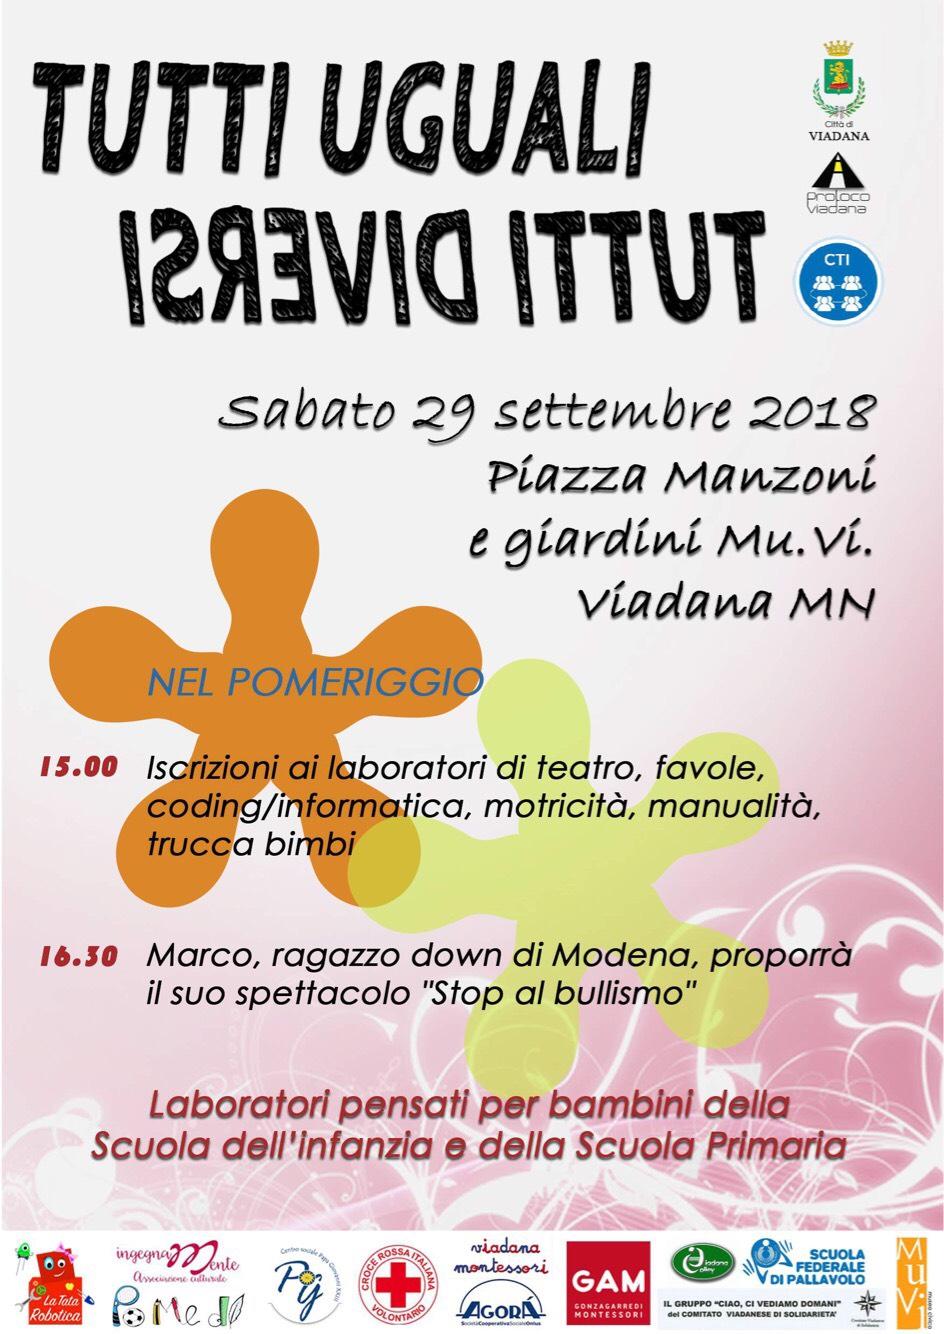 29/09/2018 - TUTTI UGUALI TUTTI DIVERSI